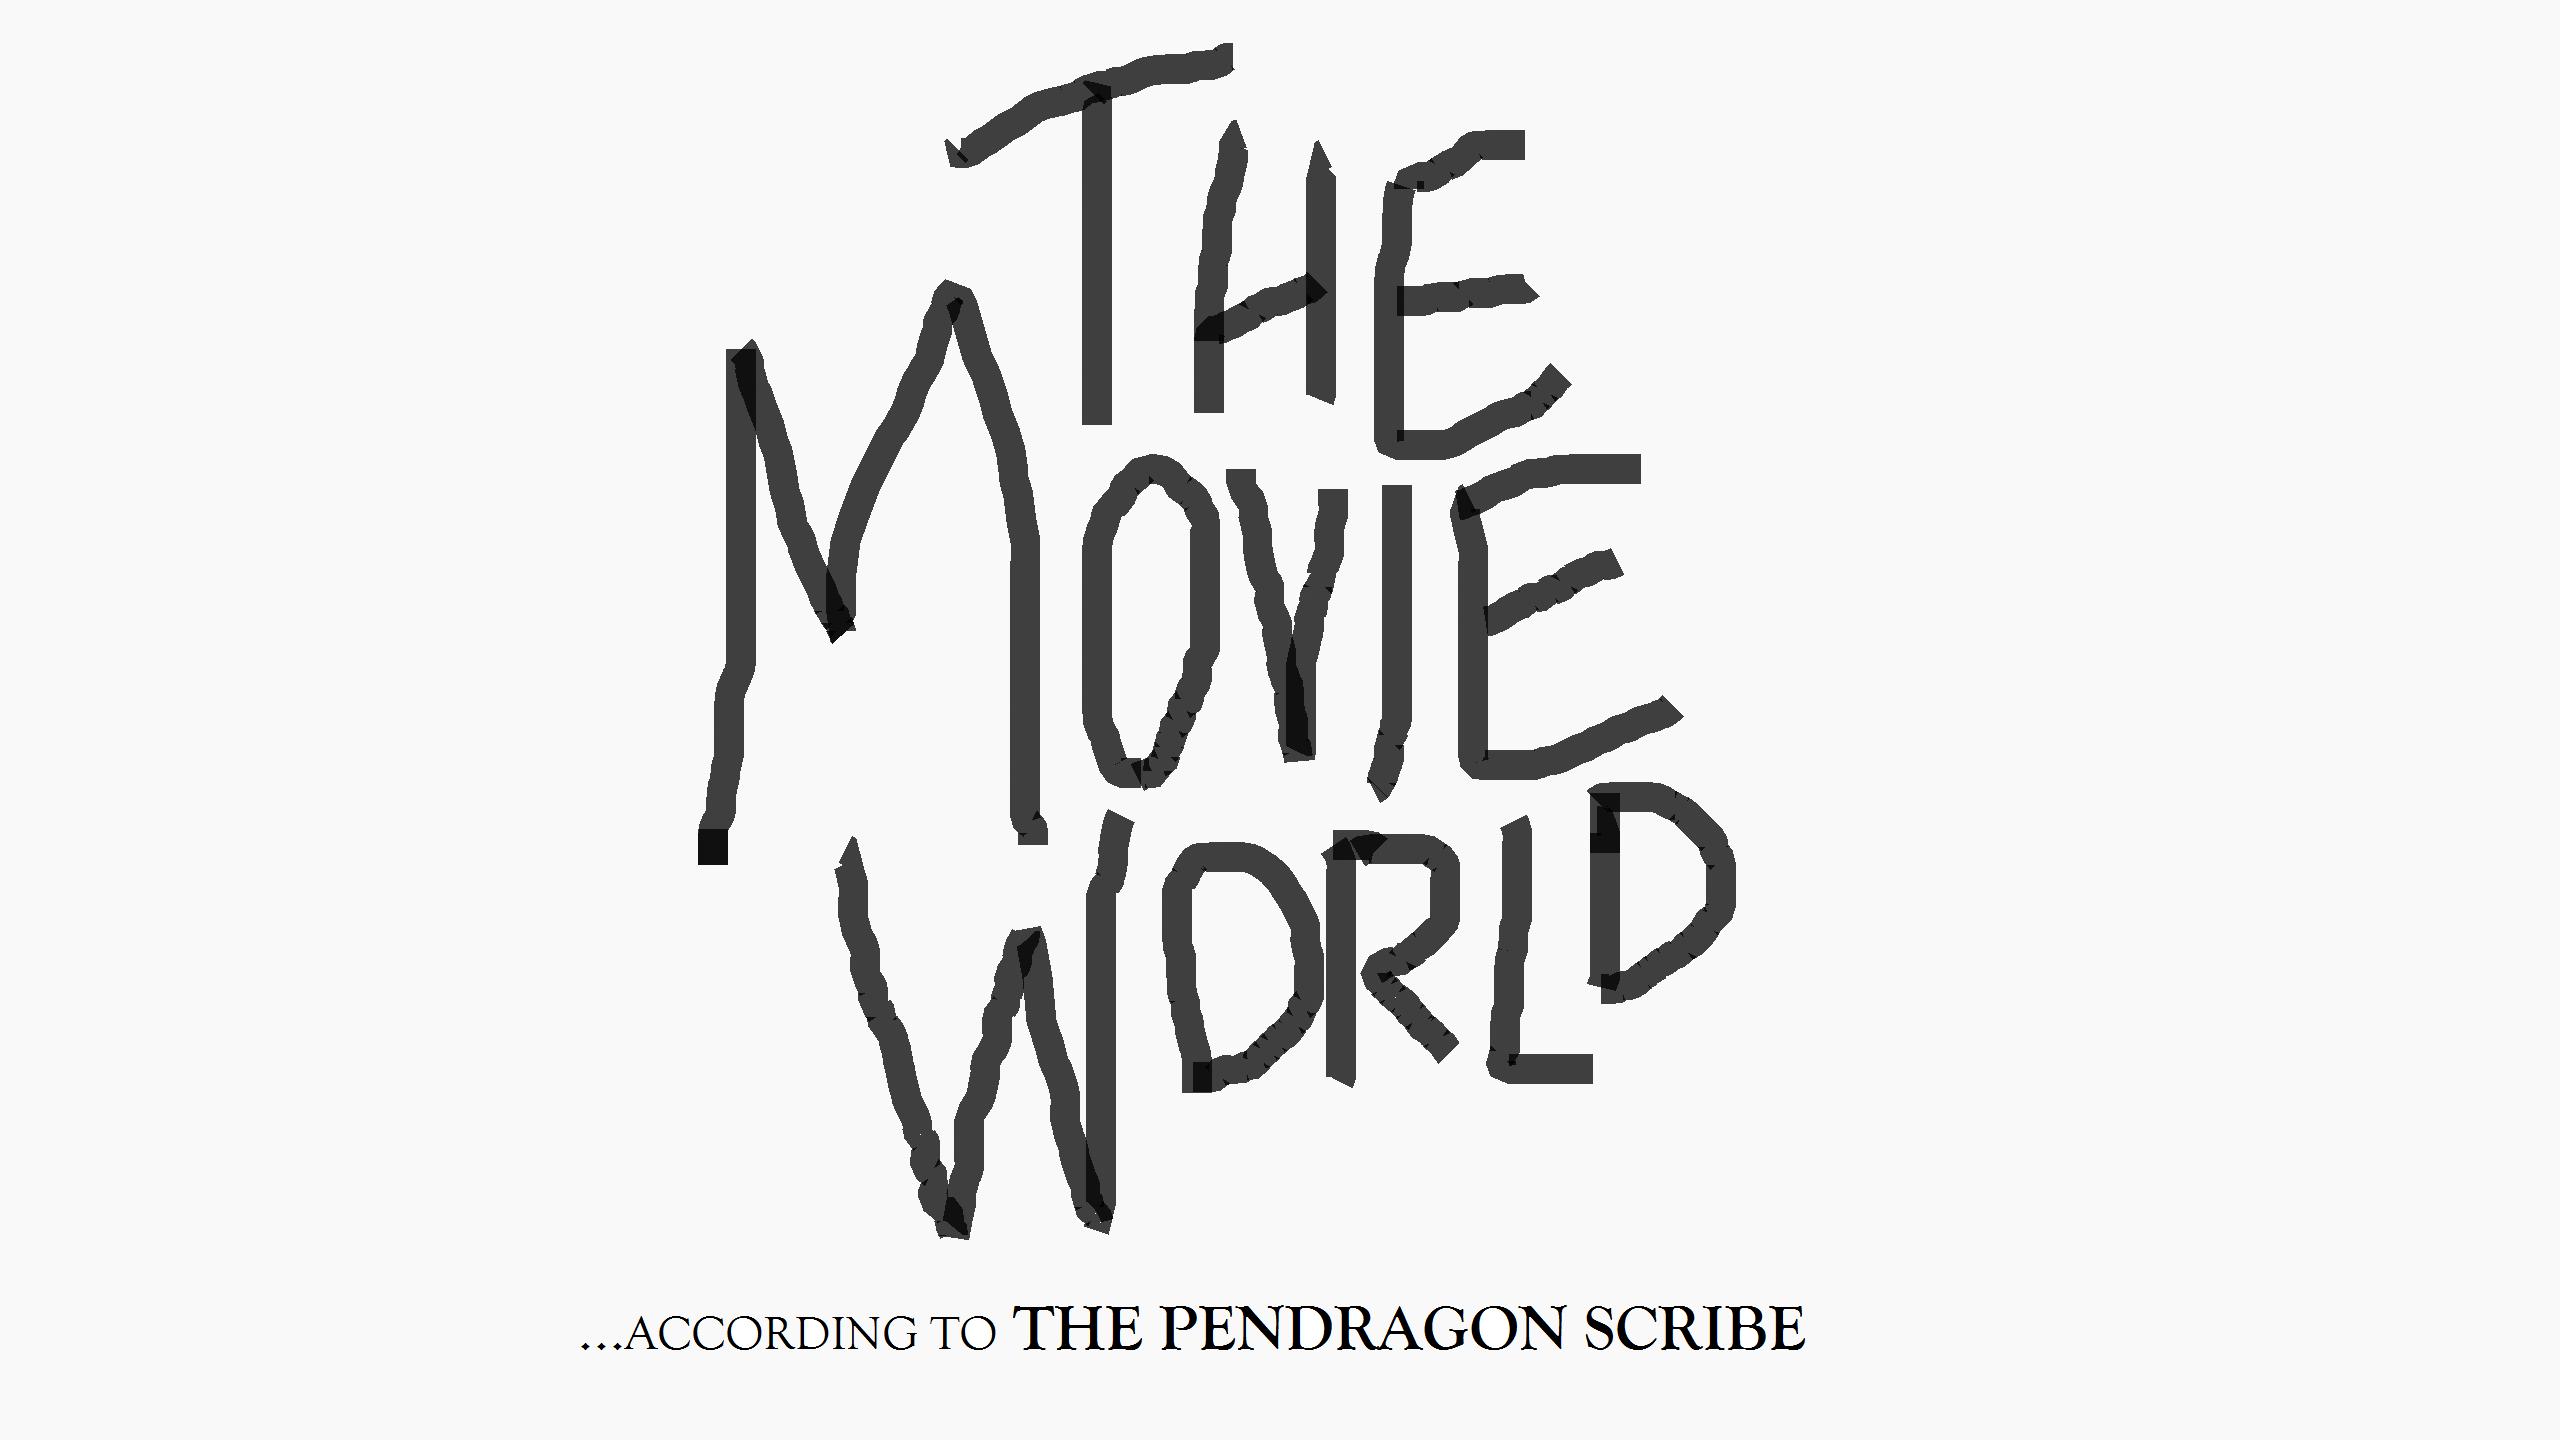 THE MOVIE WORLD